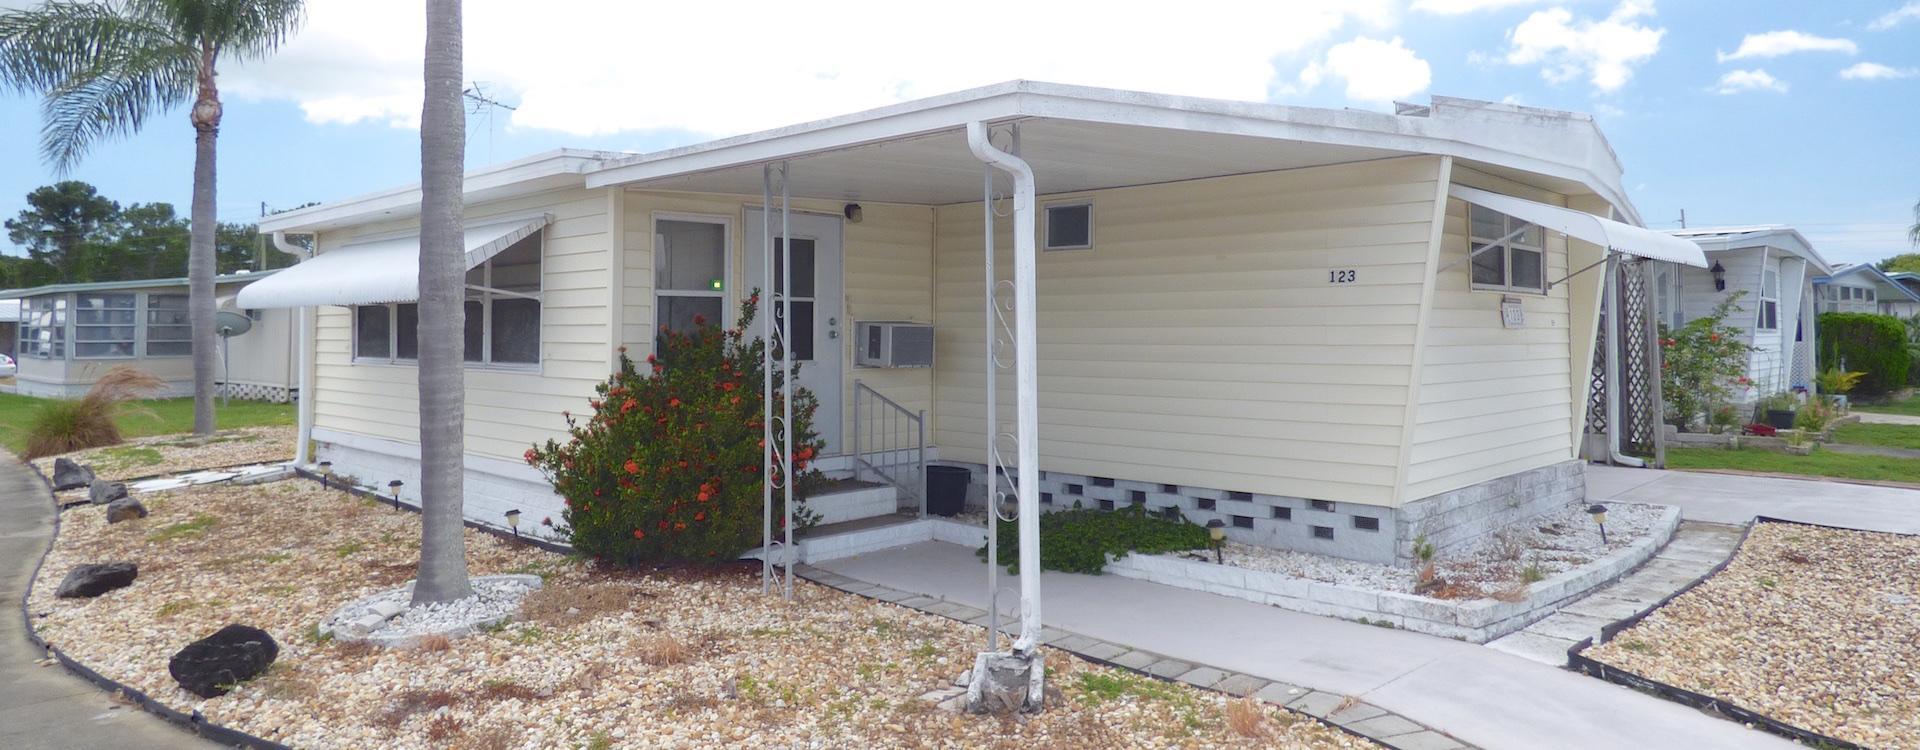 City Of New Port Richey >> Mobile Home For Sale - Largo, FL Four Seasons Estates #123